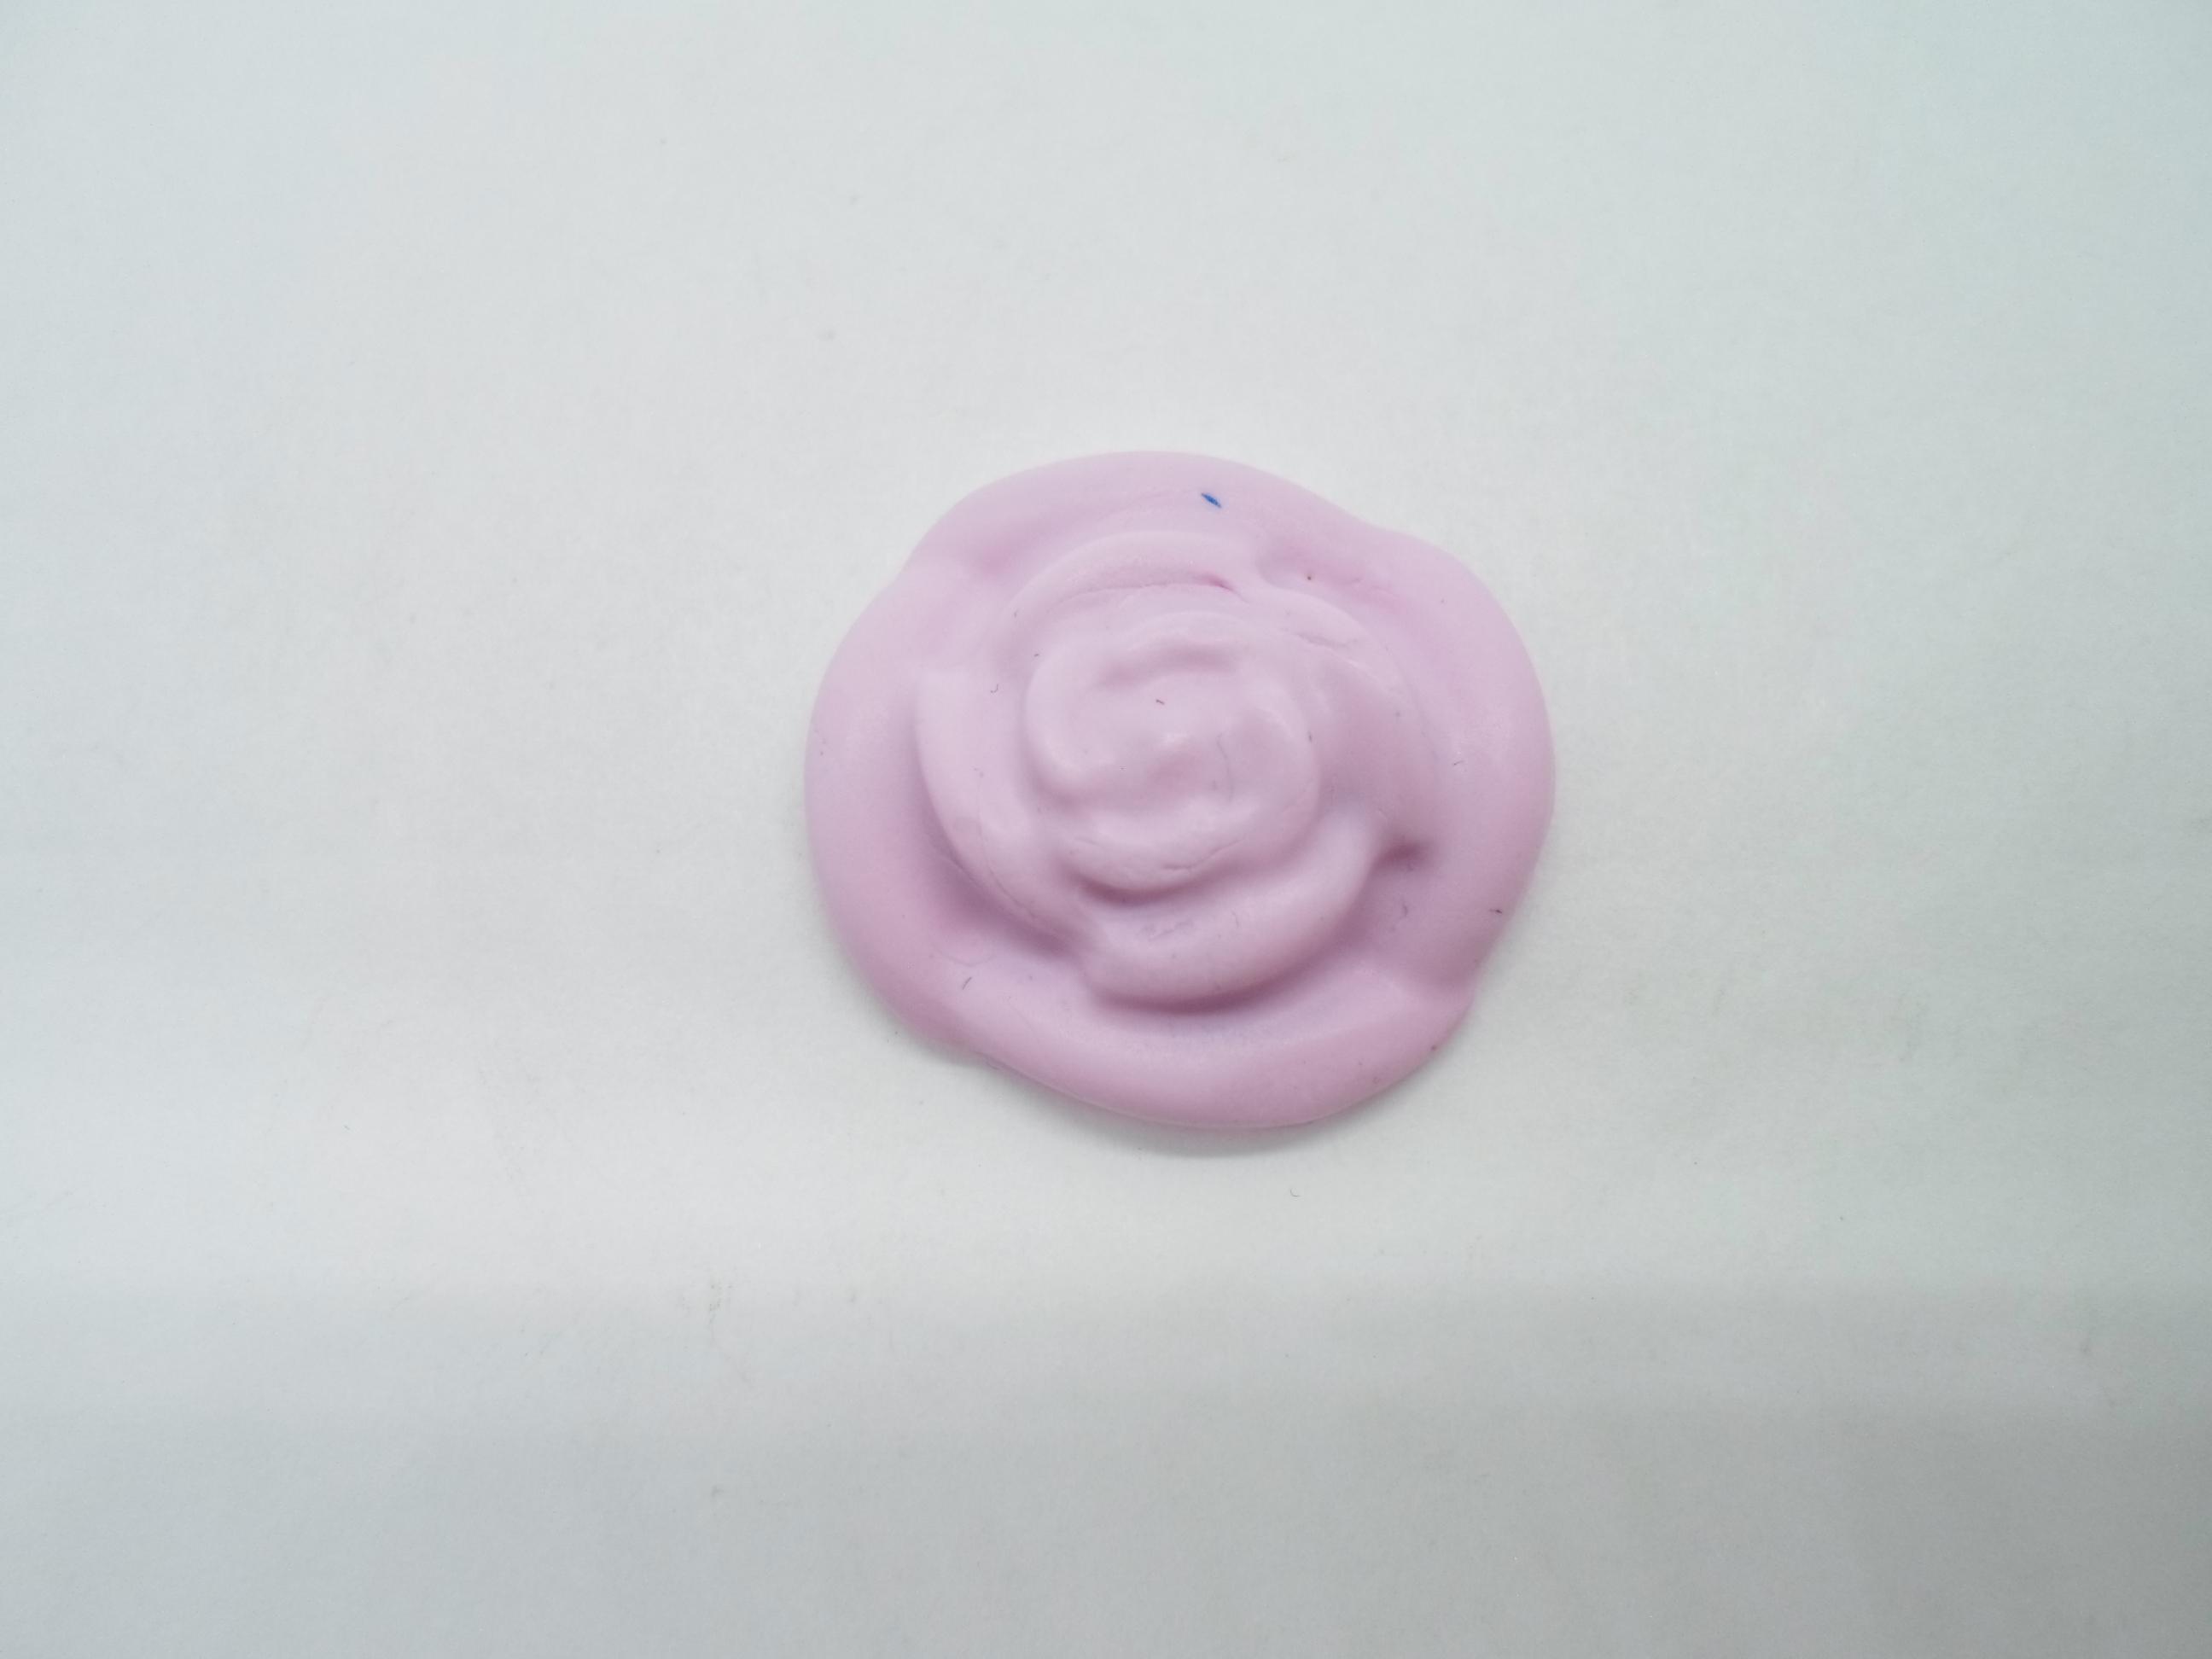 troc de troc 1 fleur en fimo taille moyenne rose image 0